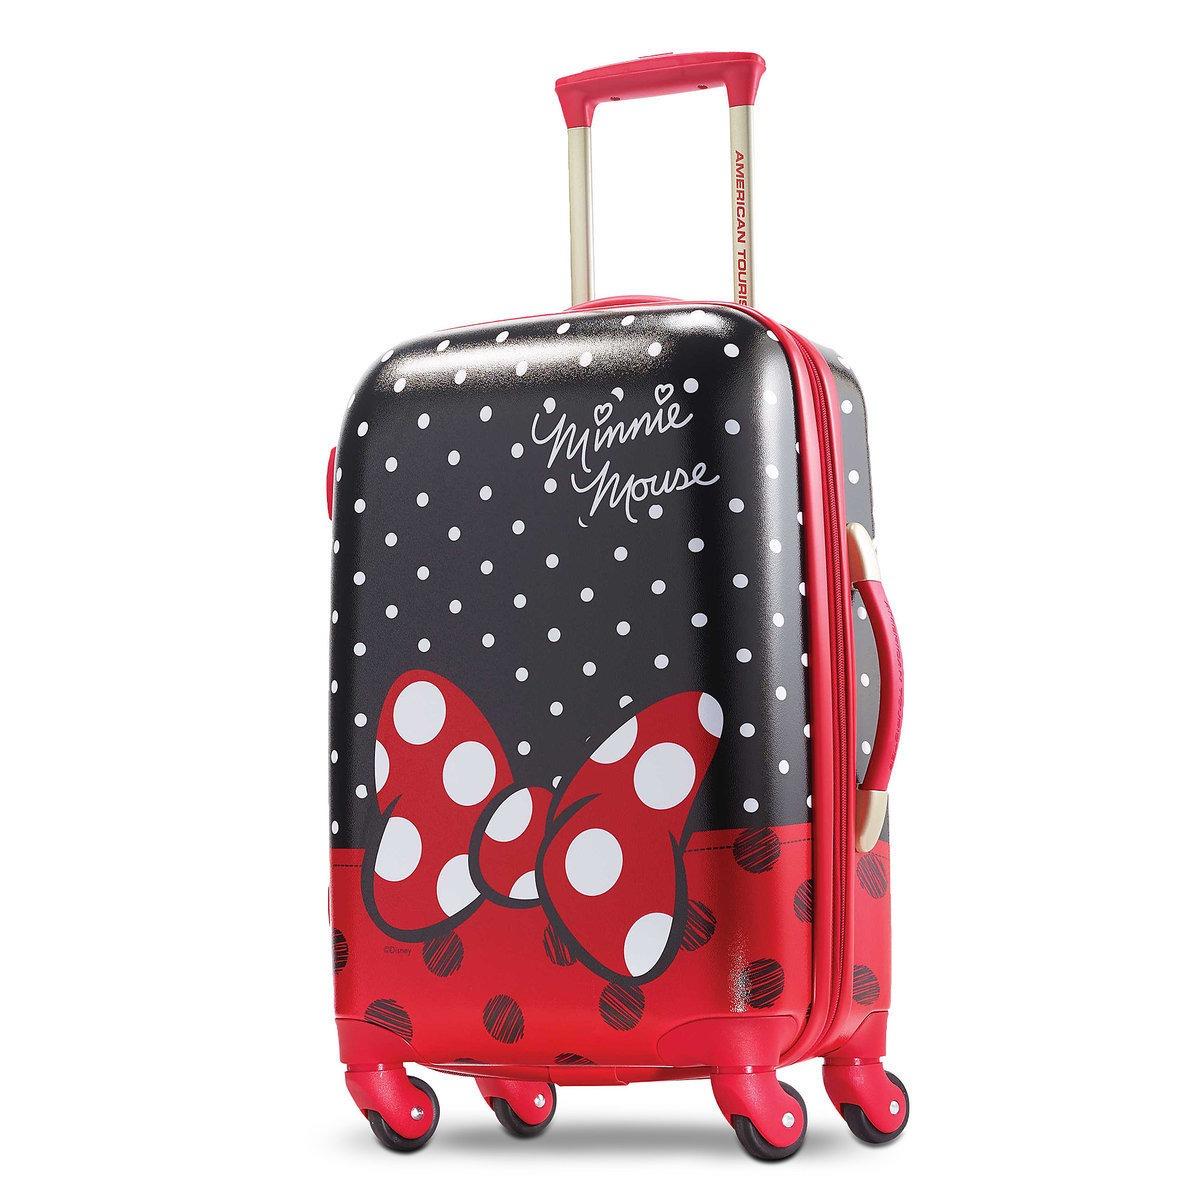 2b97017eb maleta bolsa minnie mouse viaje original mickey disney store. Cargando zoom.